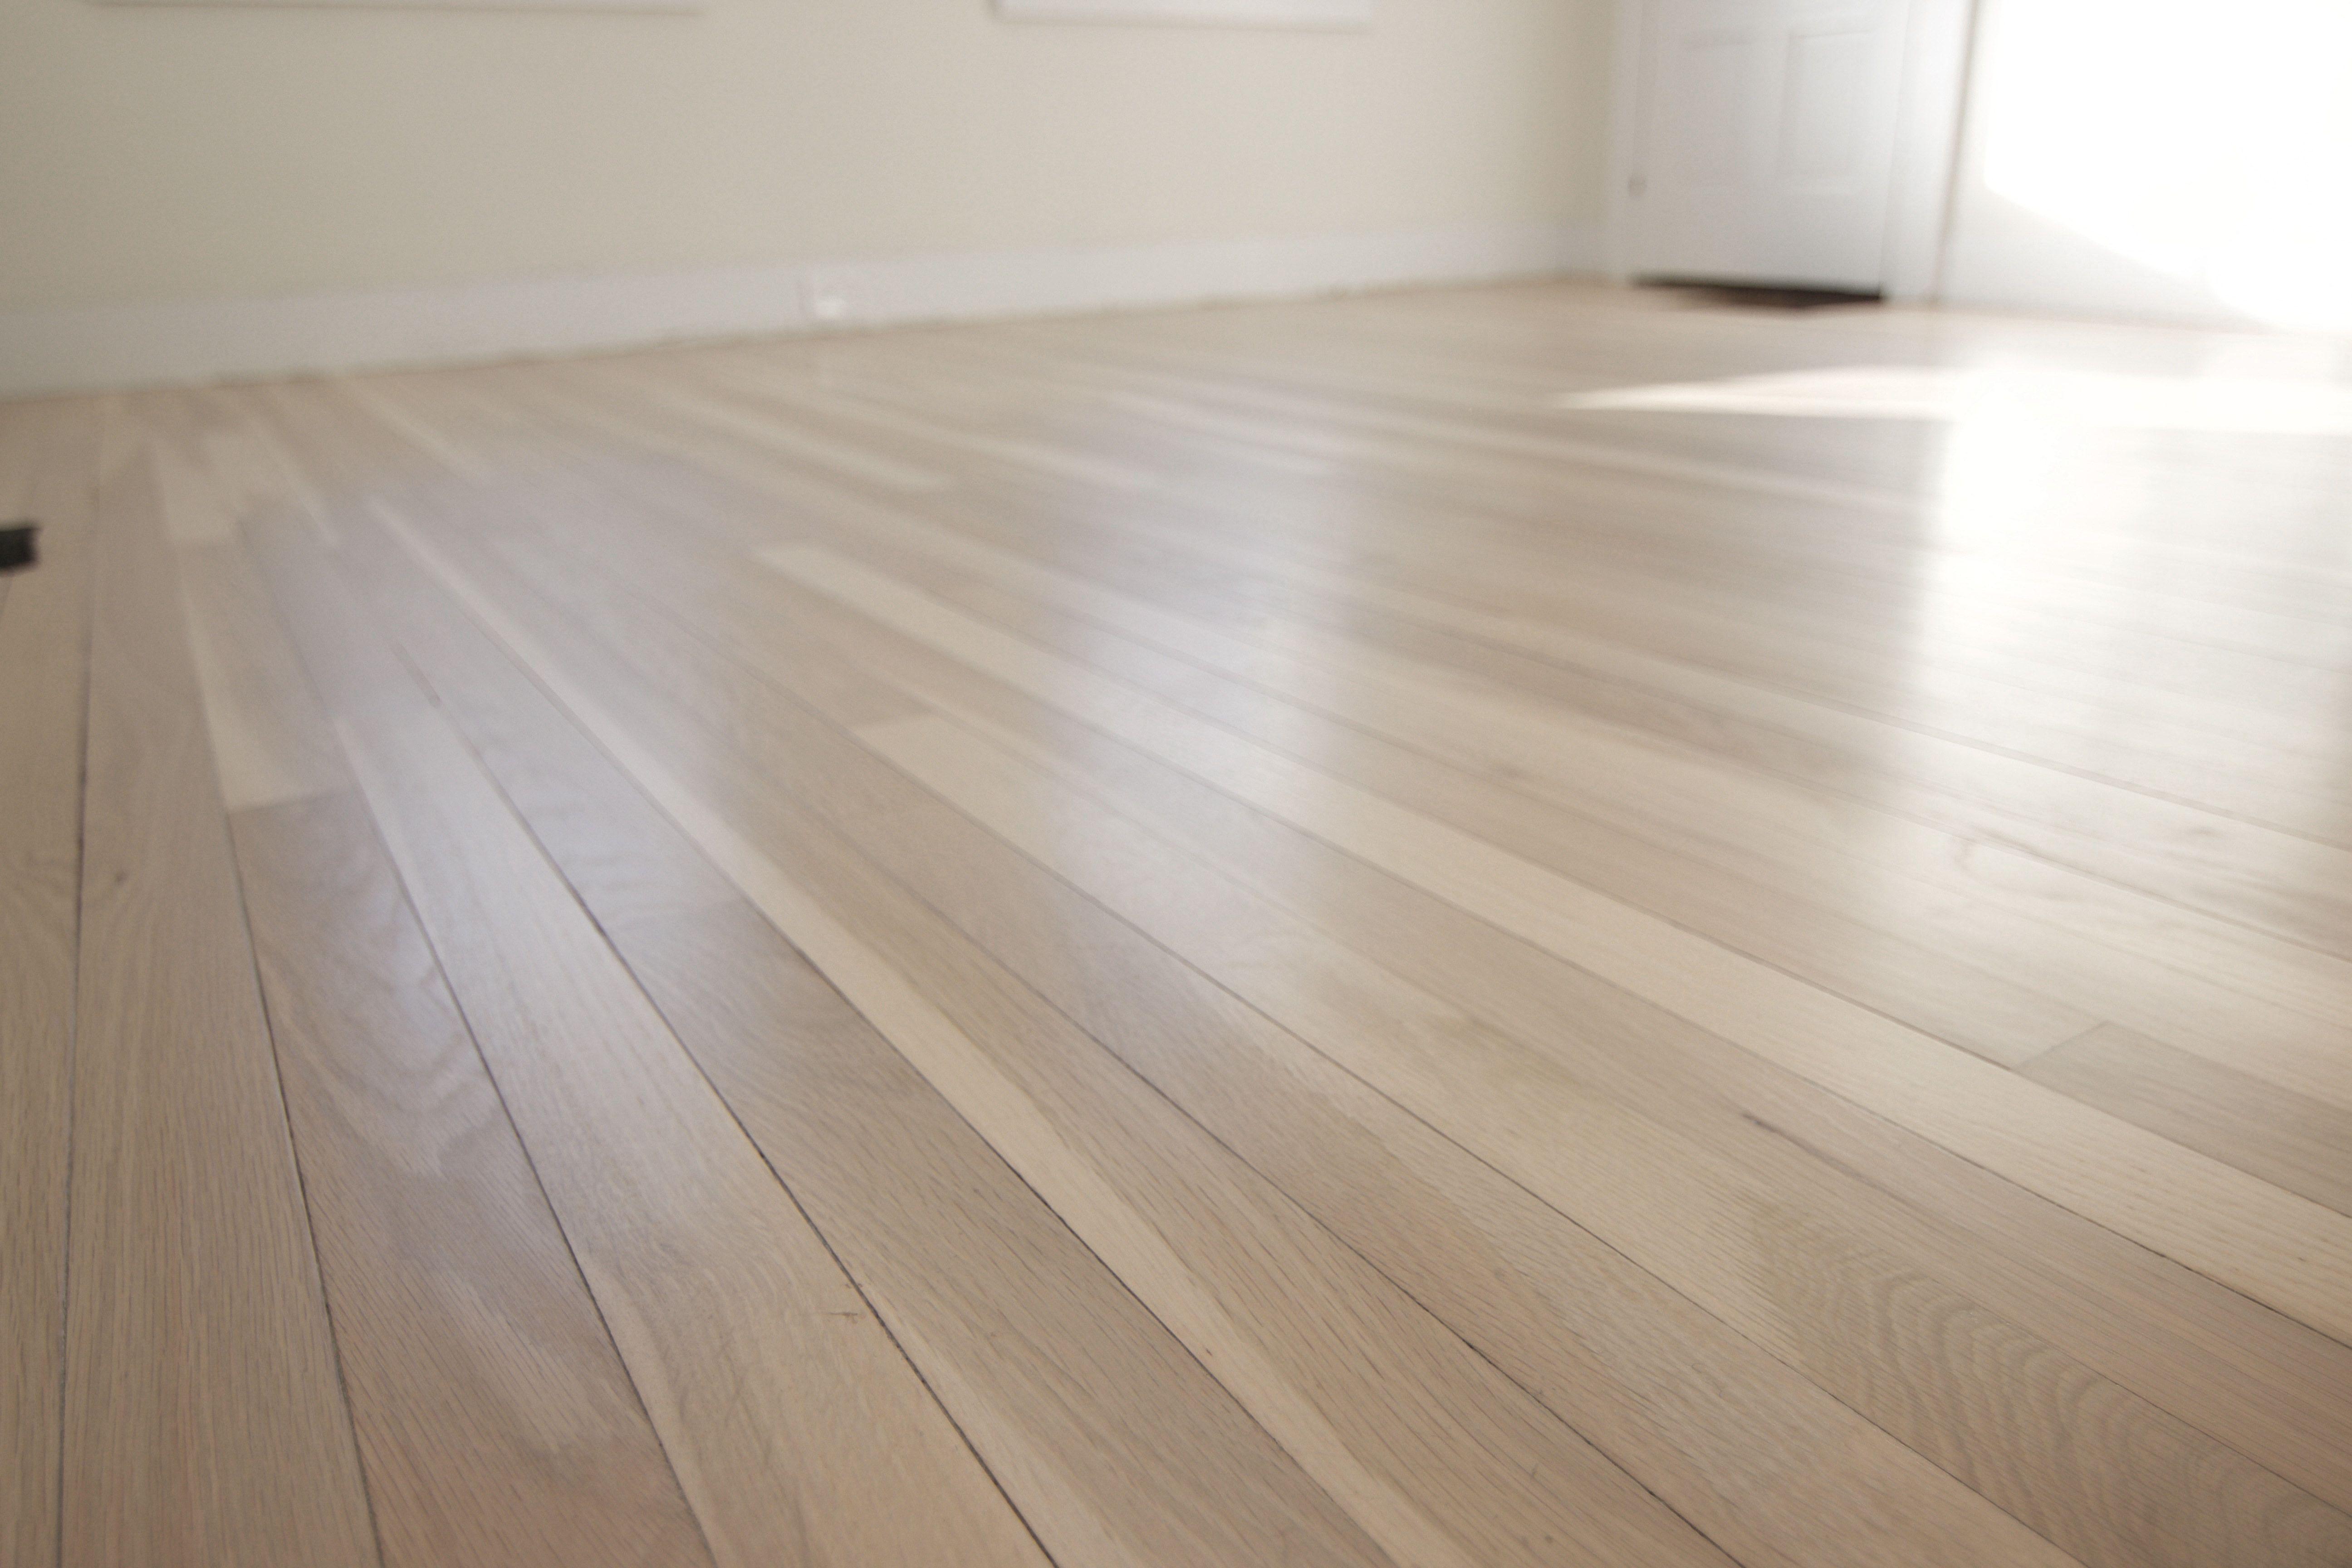 Bona Nordic Seal On Existing White Oak Floors Wood Floor Stain Colors White Oak Hardwood Floors Hardwood Floor Colors